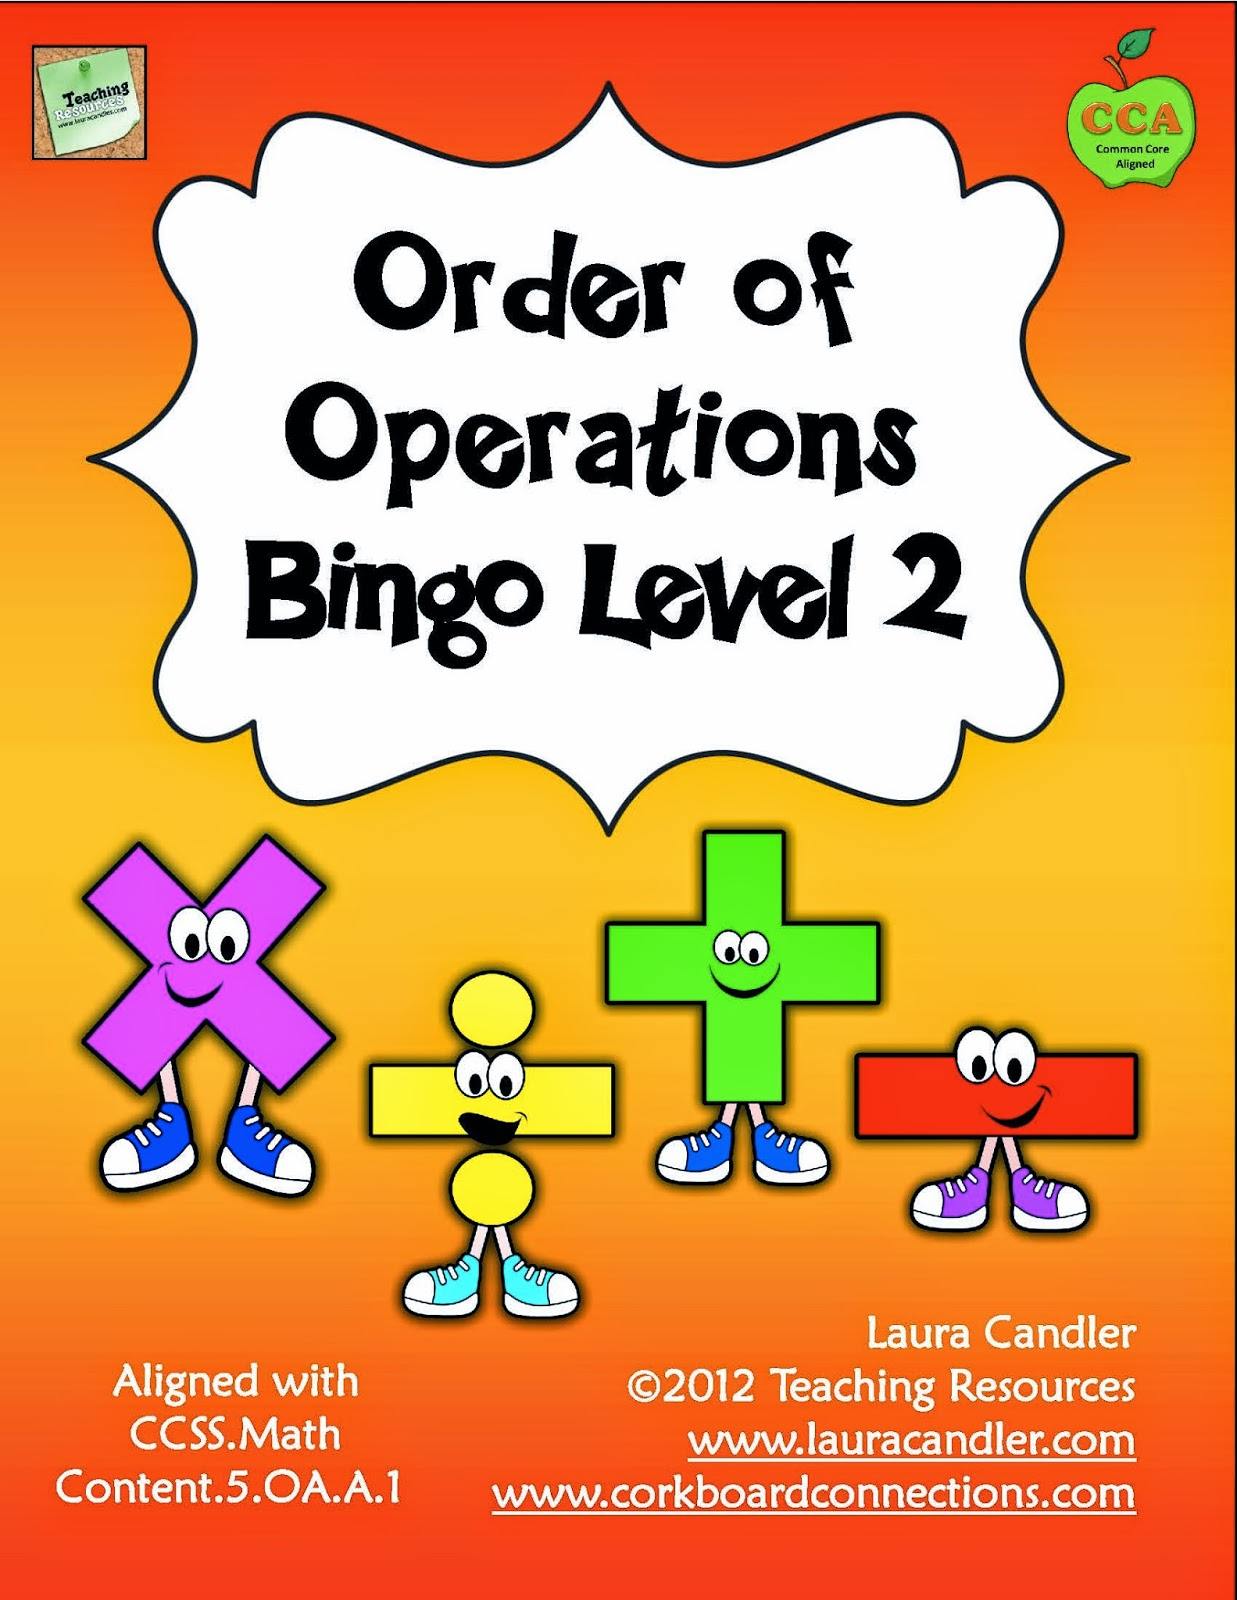 worksheet Order Of Operation teachingisagift ooo i love it order of operations bingo game game